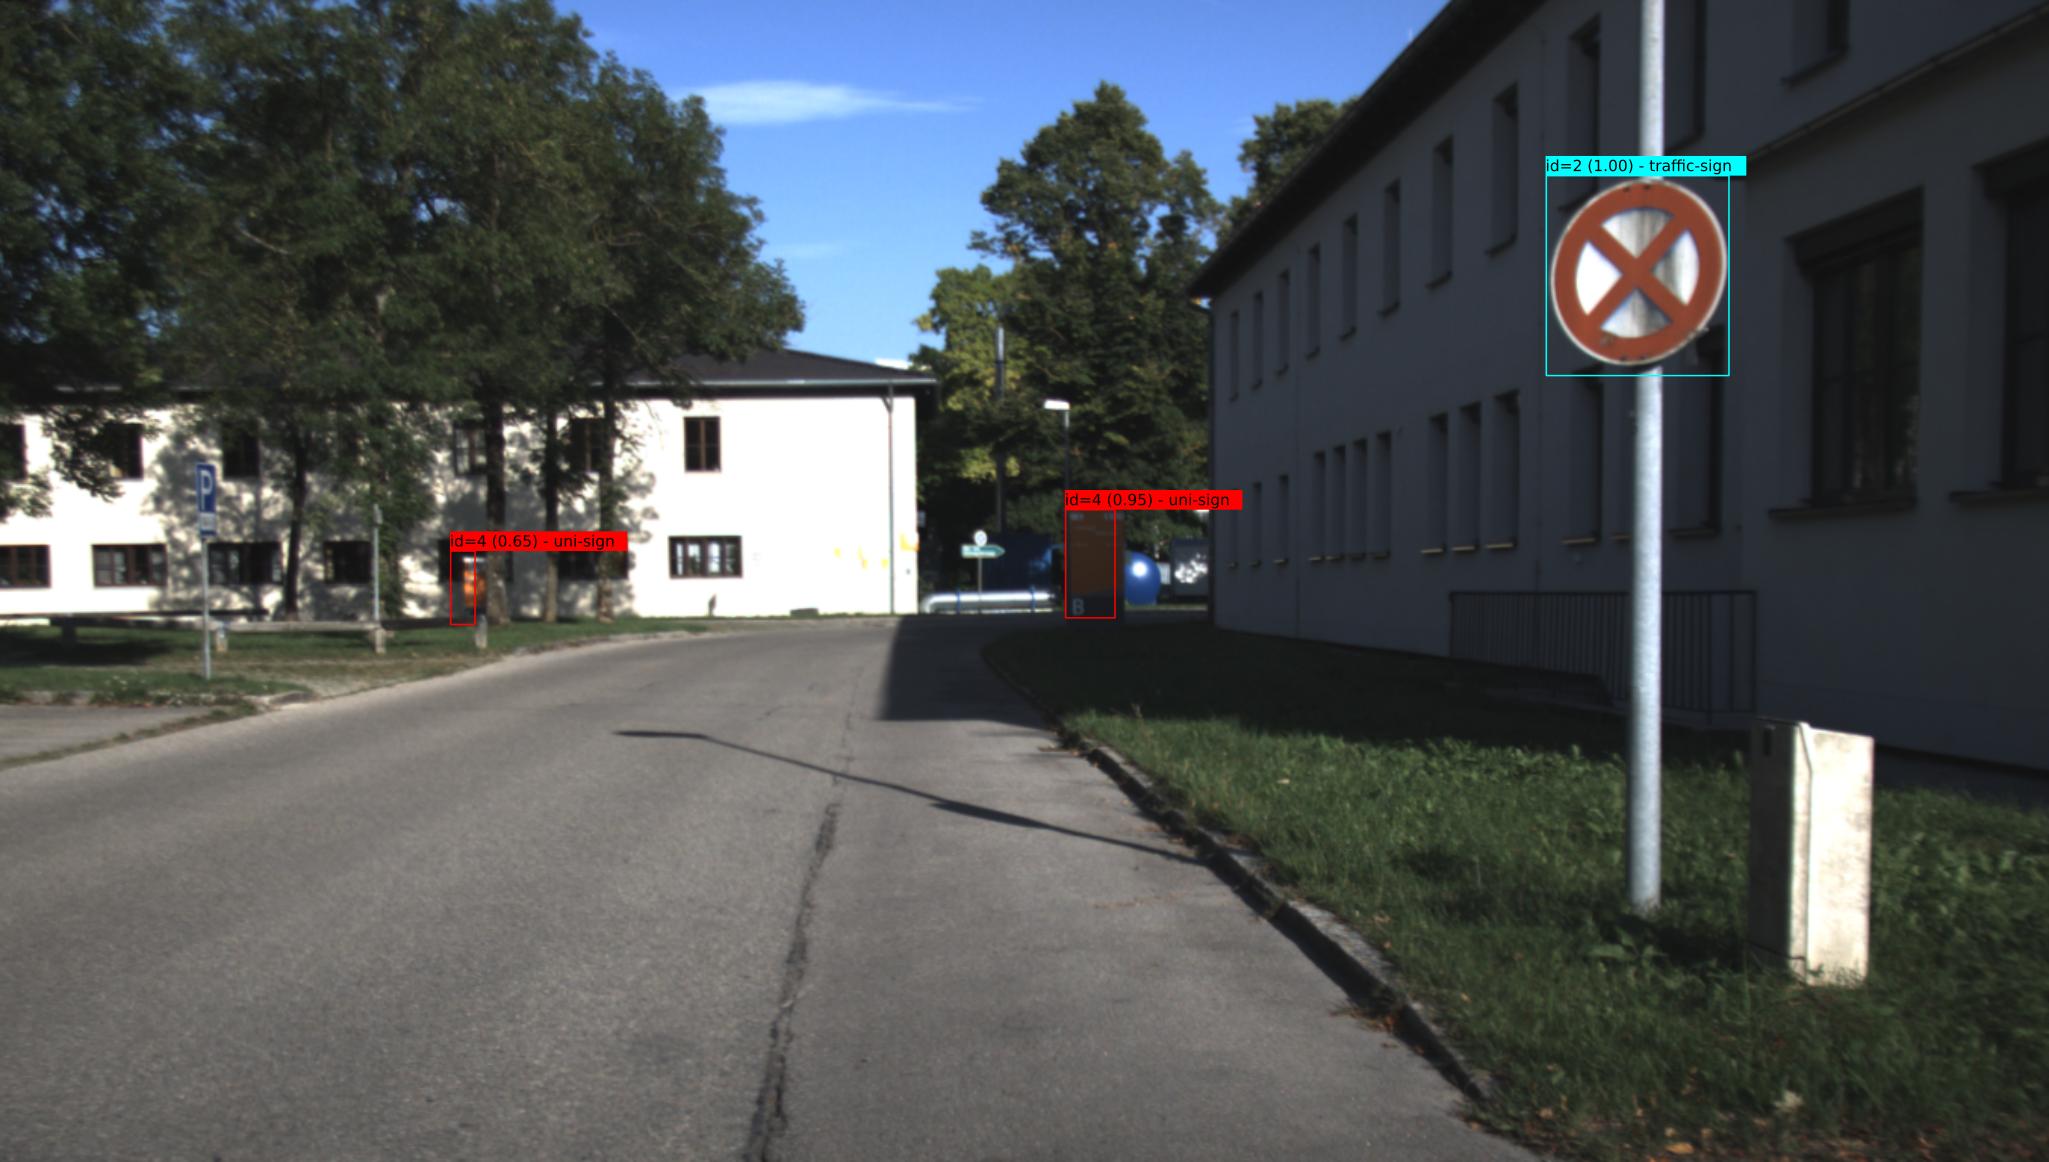 Modellbasierte Objektdetektion